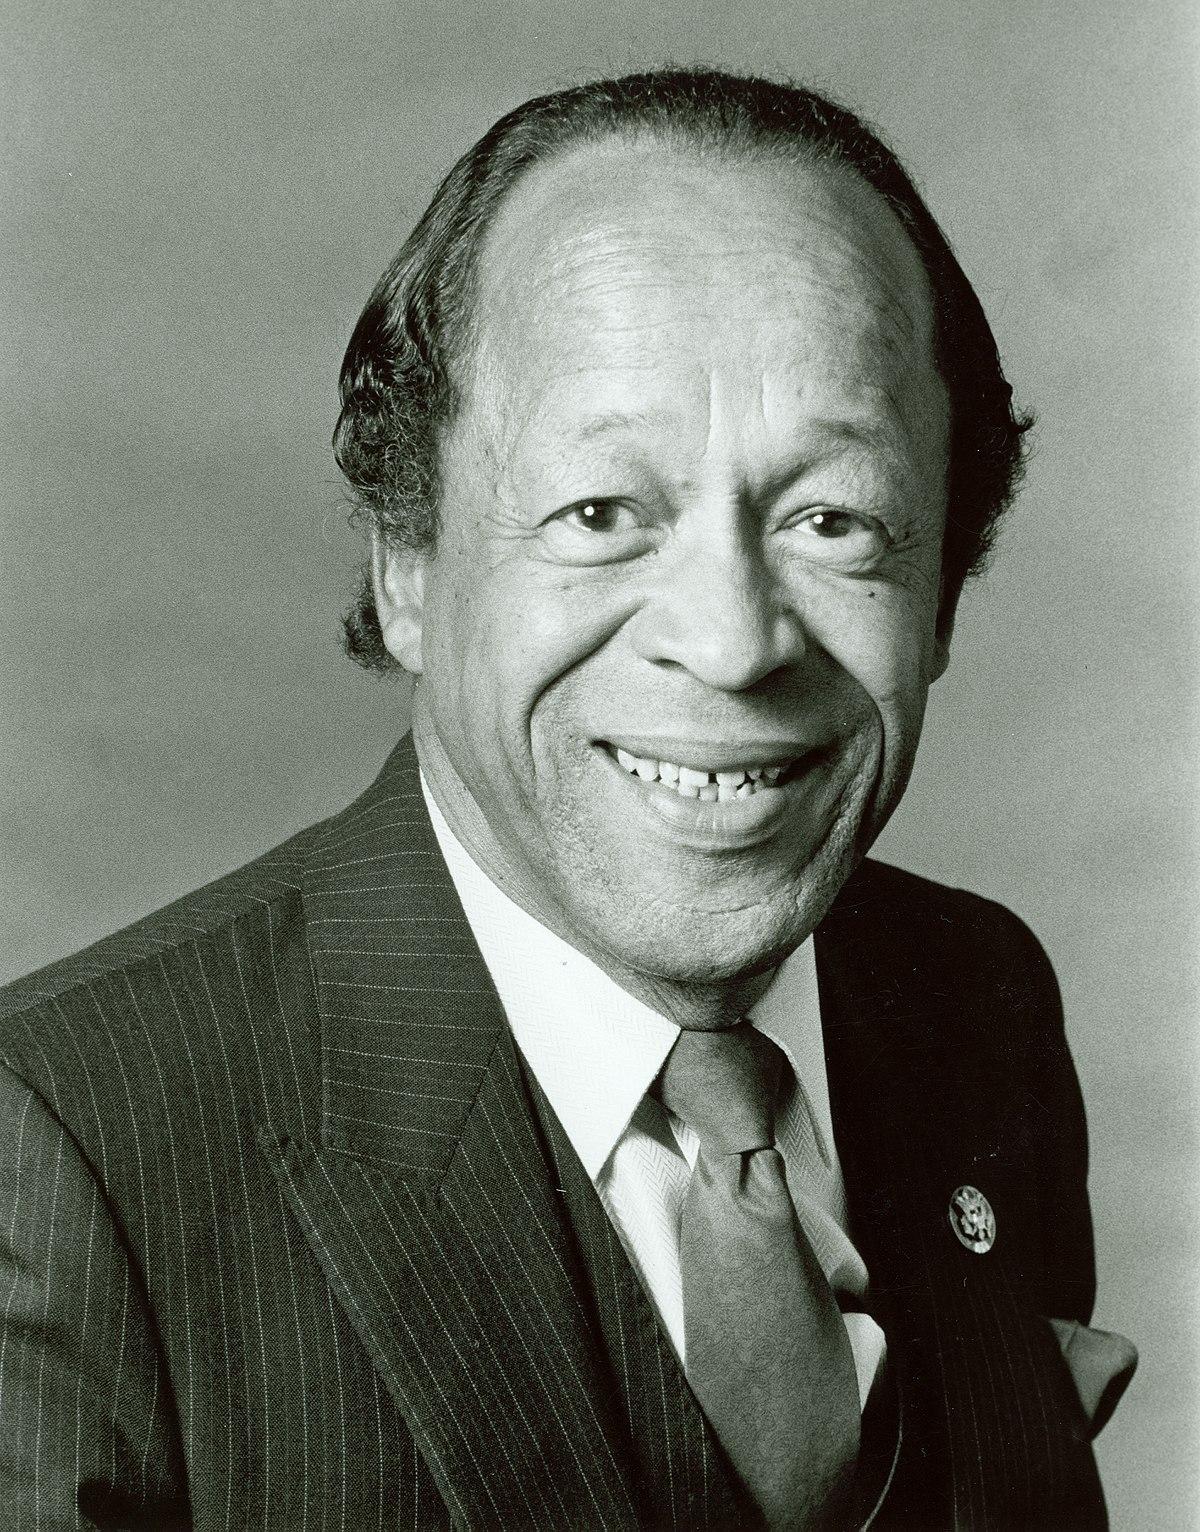 Gus Savage